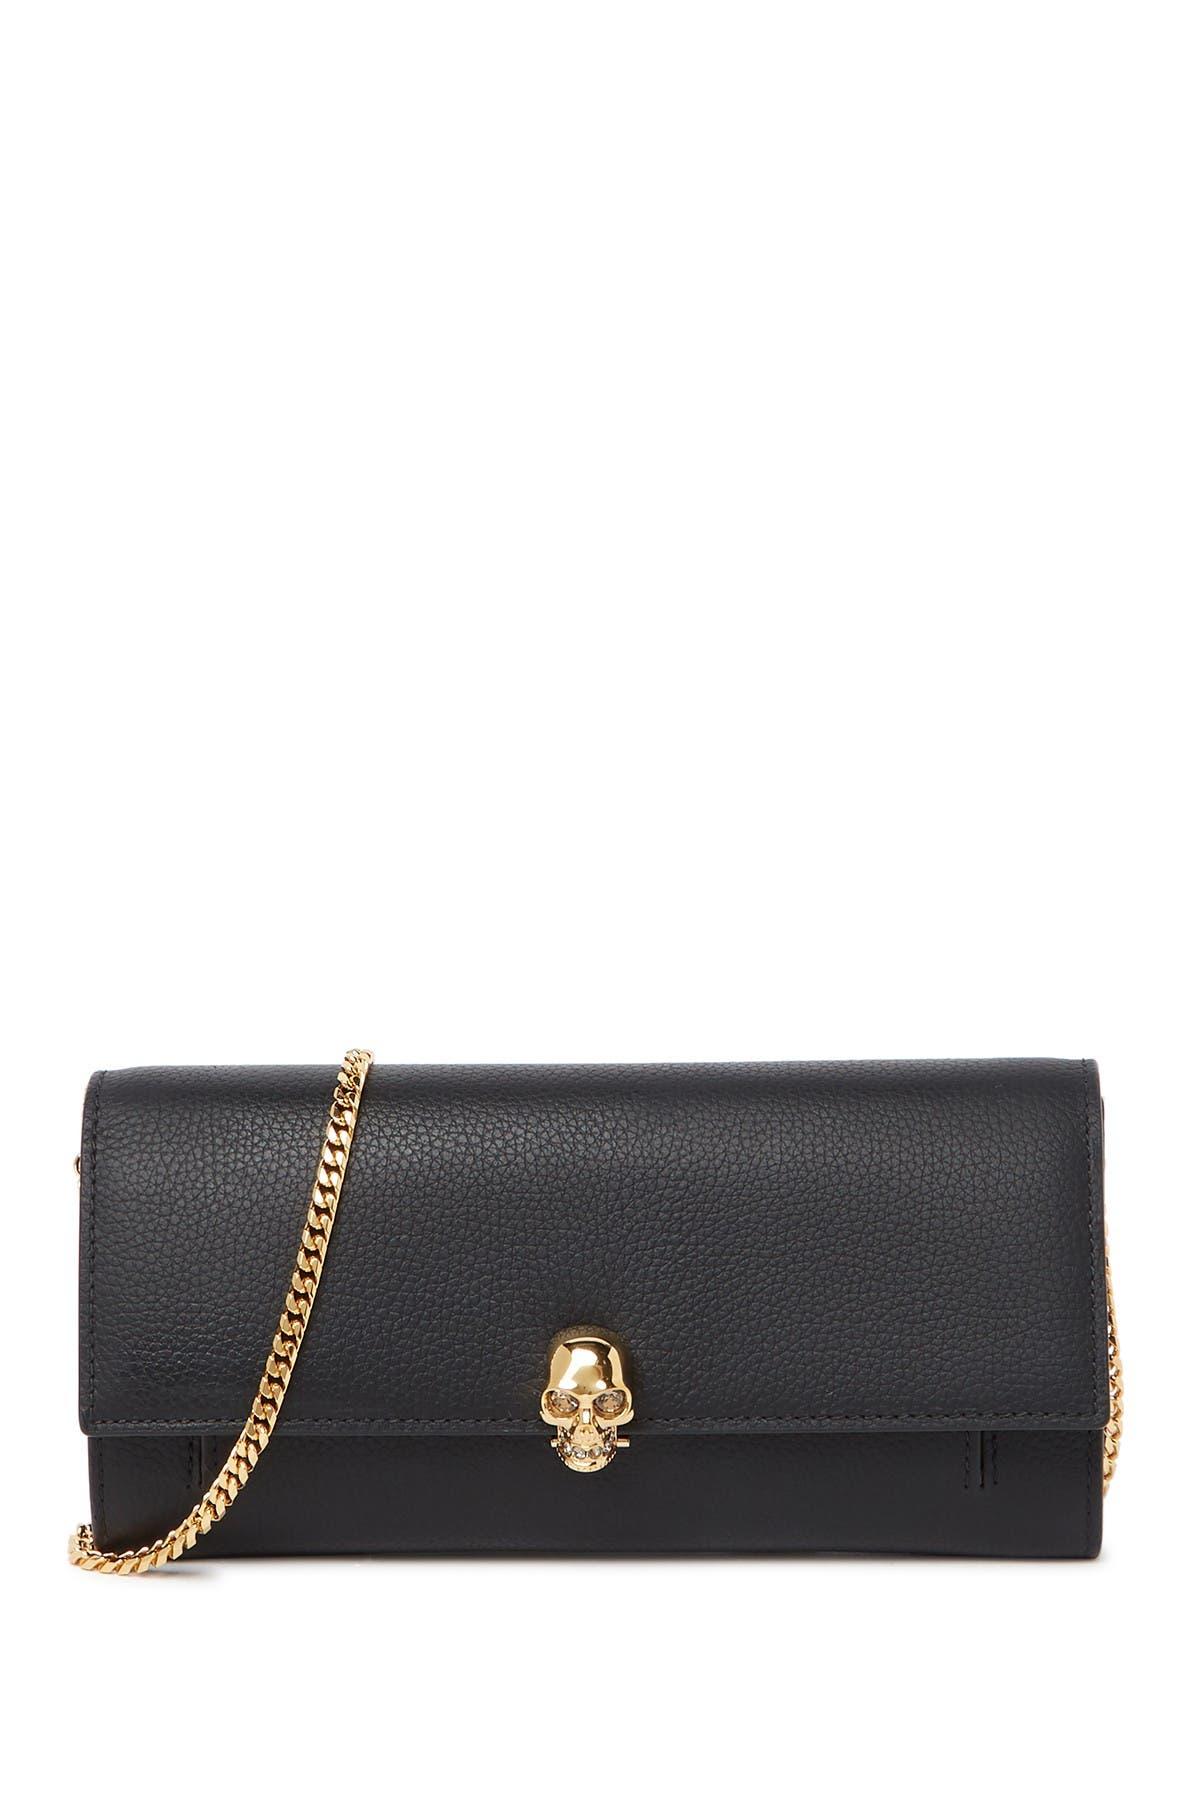 Image of Alexander McQueen Small Grain Leather Crossbody Wallet